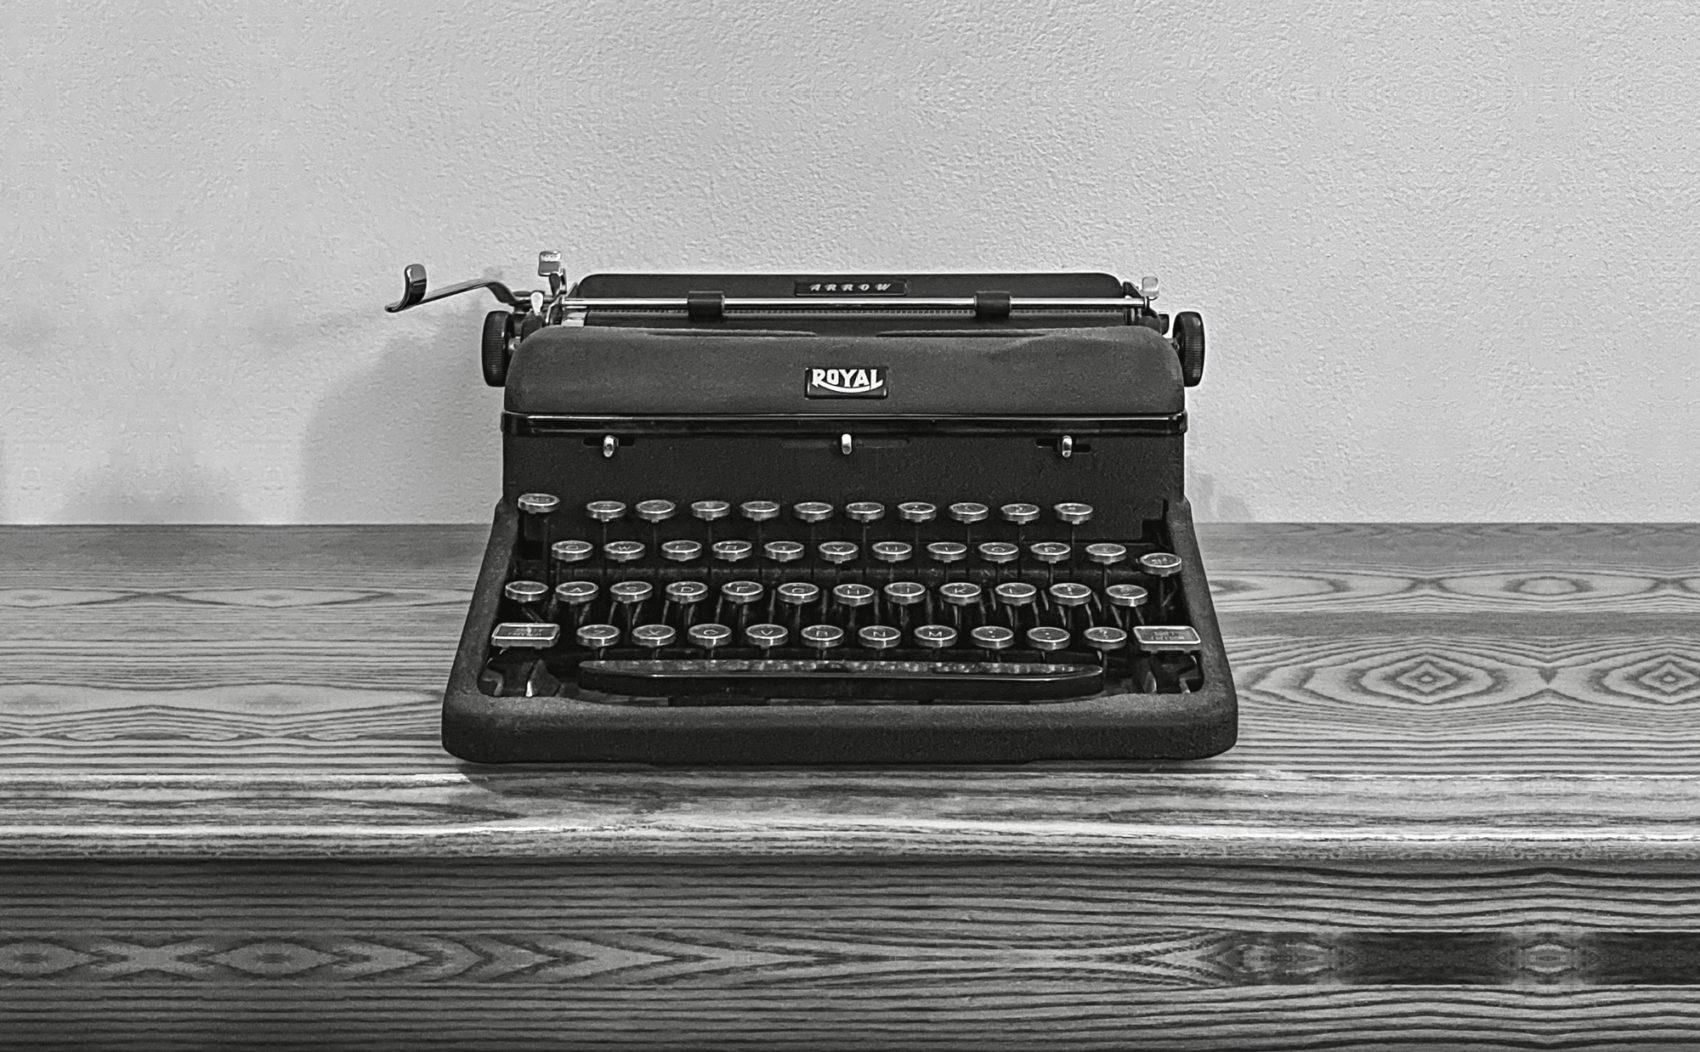 Royal Arrow Typewriter - Photo by Trace Meek